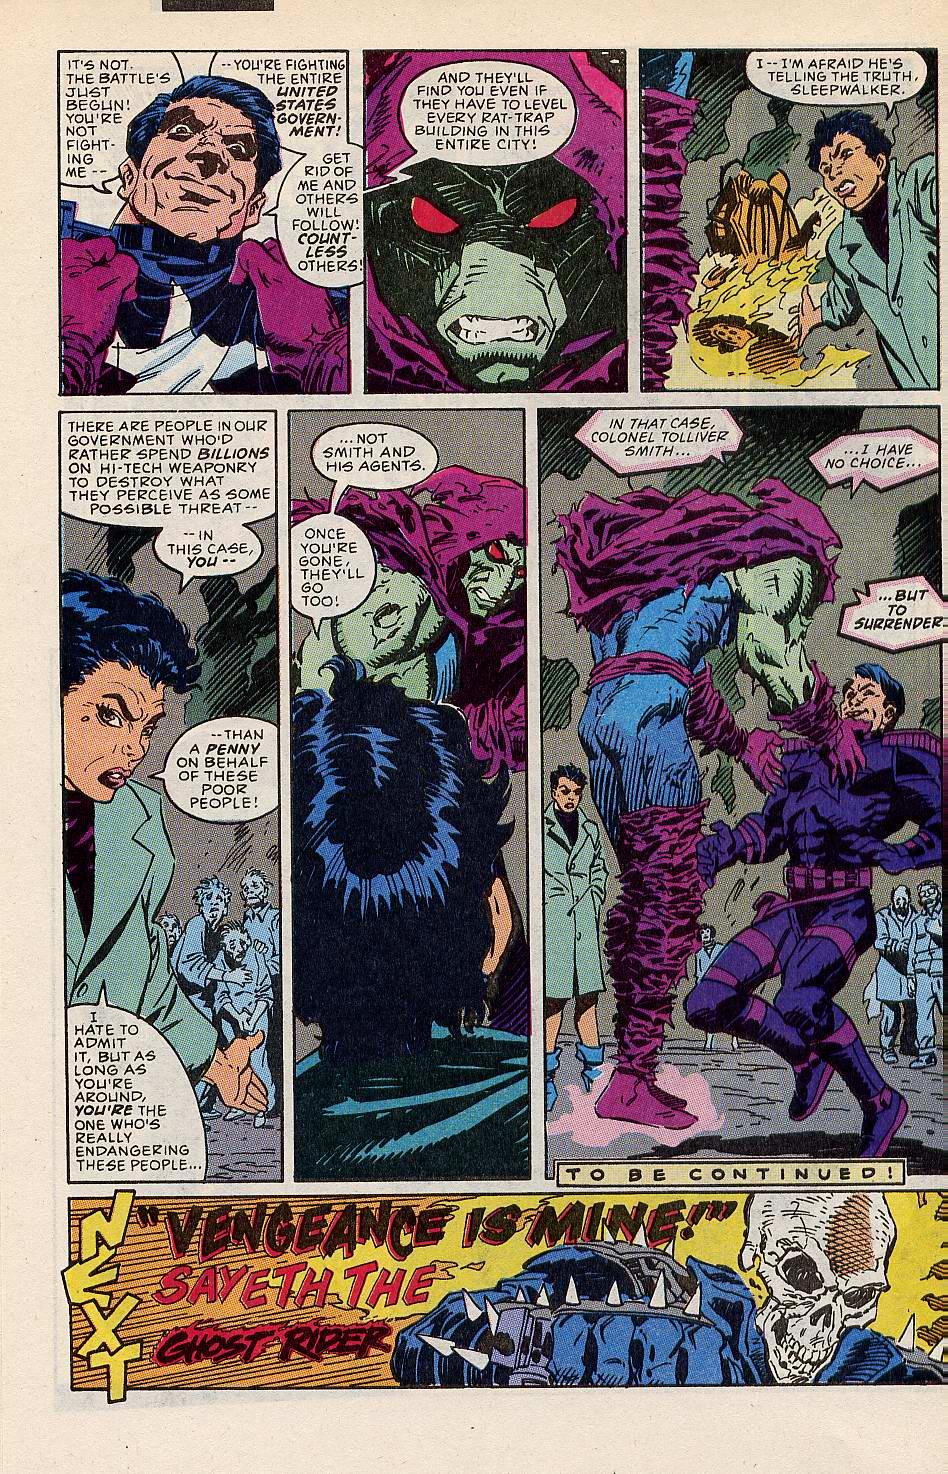 Read online Sleepwalker comic -  Issue #10 - 23